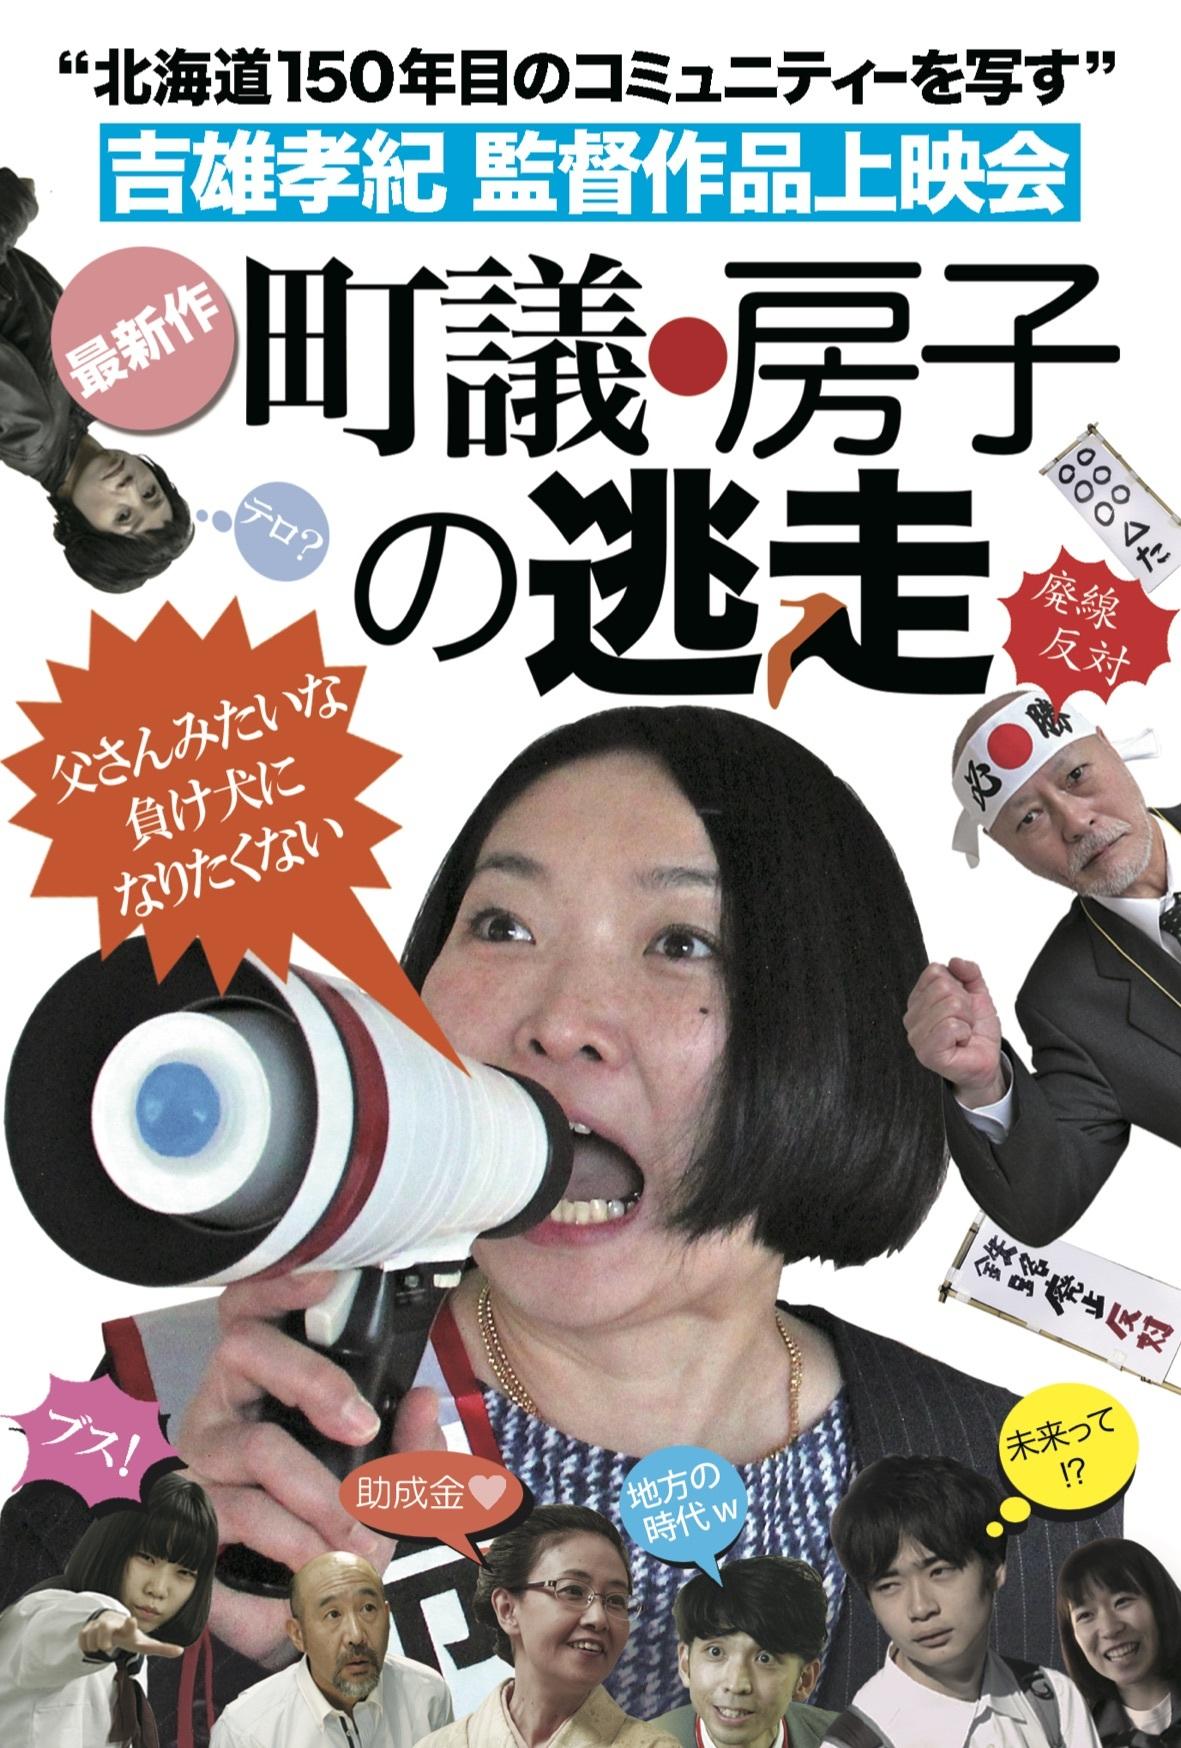 ◆7/8「視る姉」「町議・房子の逃走」上映会_d0154687_17045813.jpg